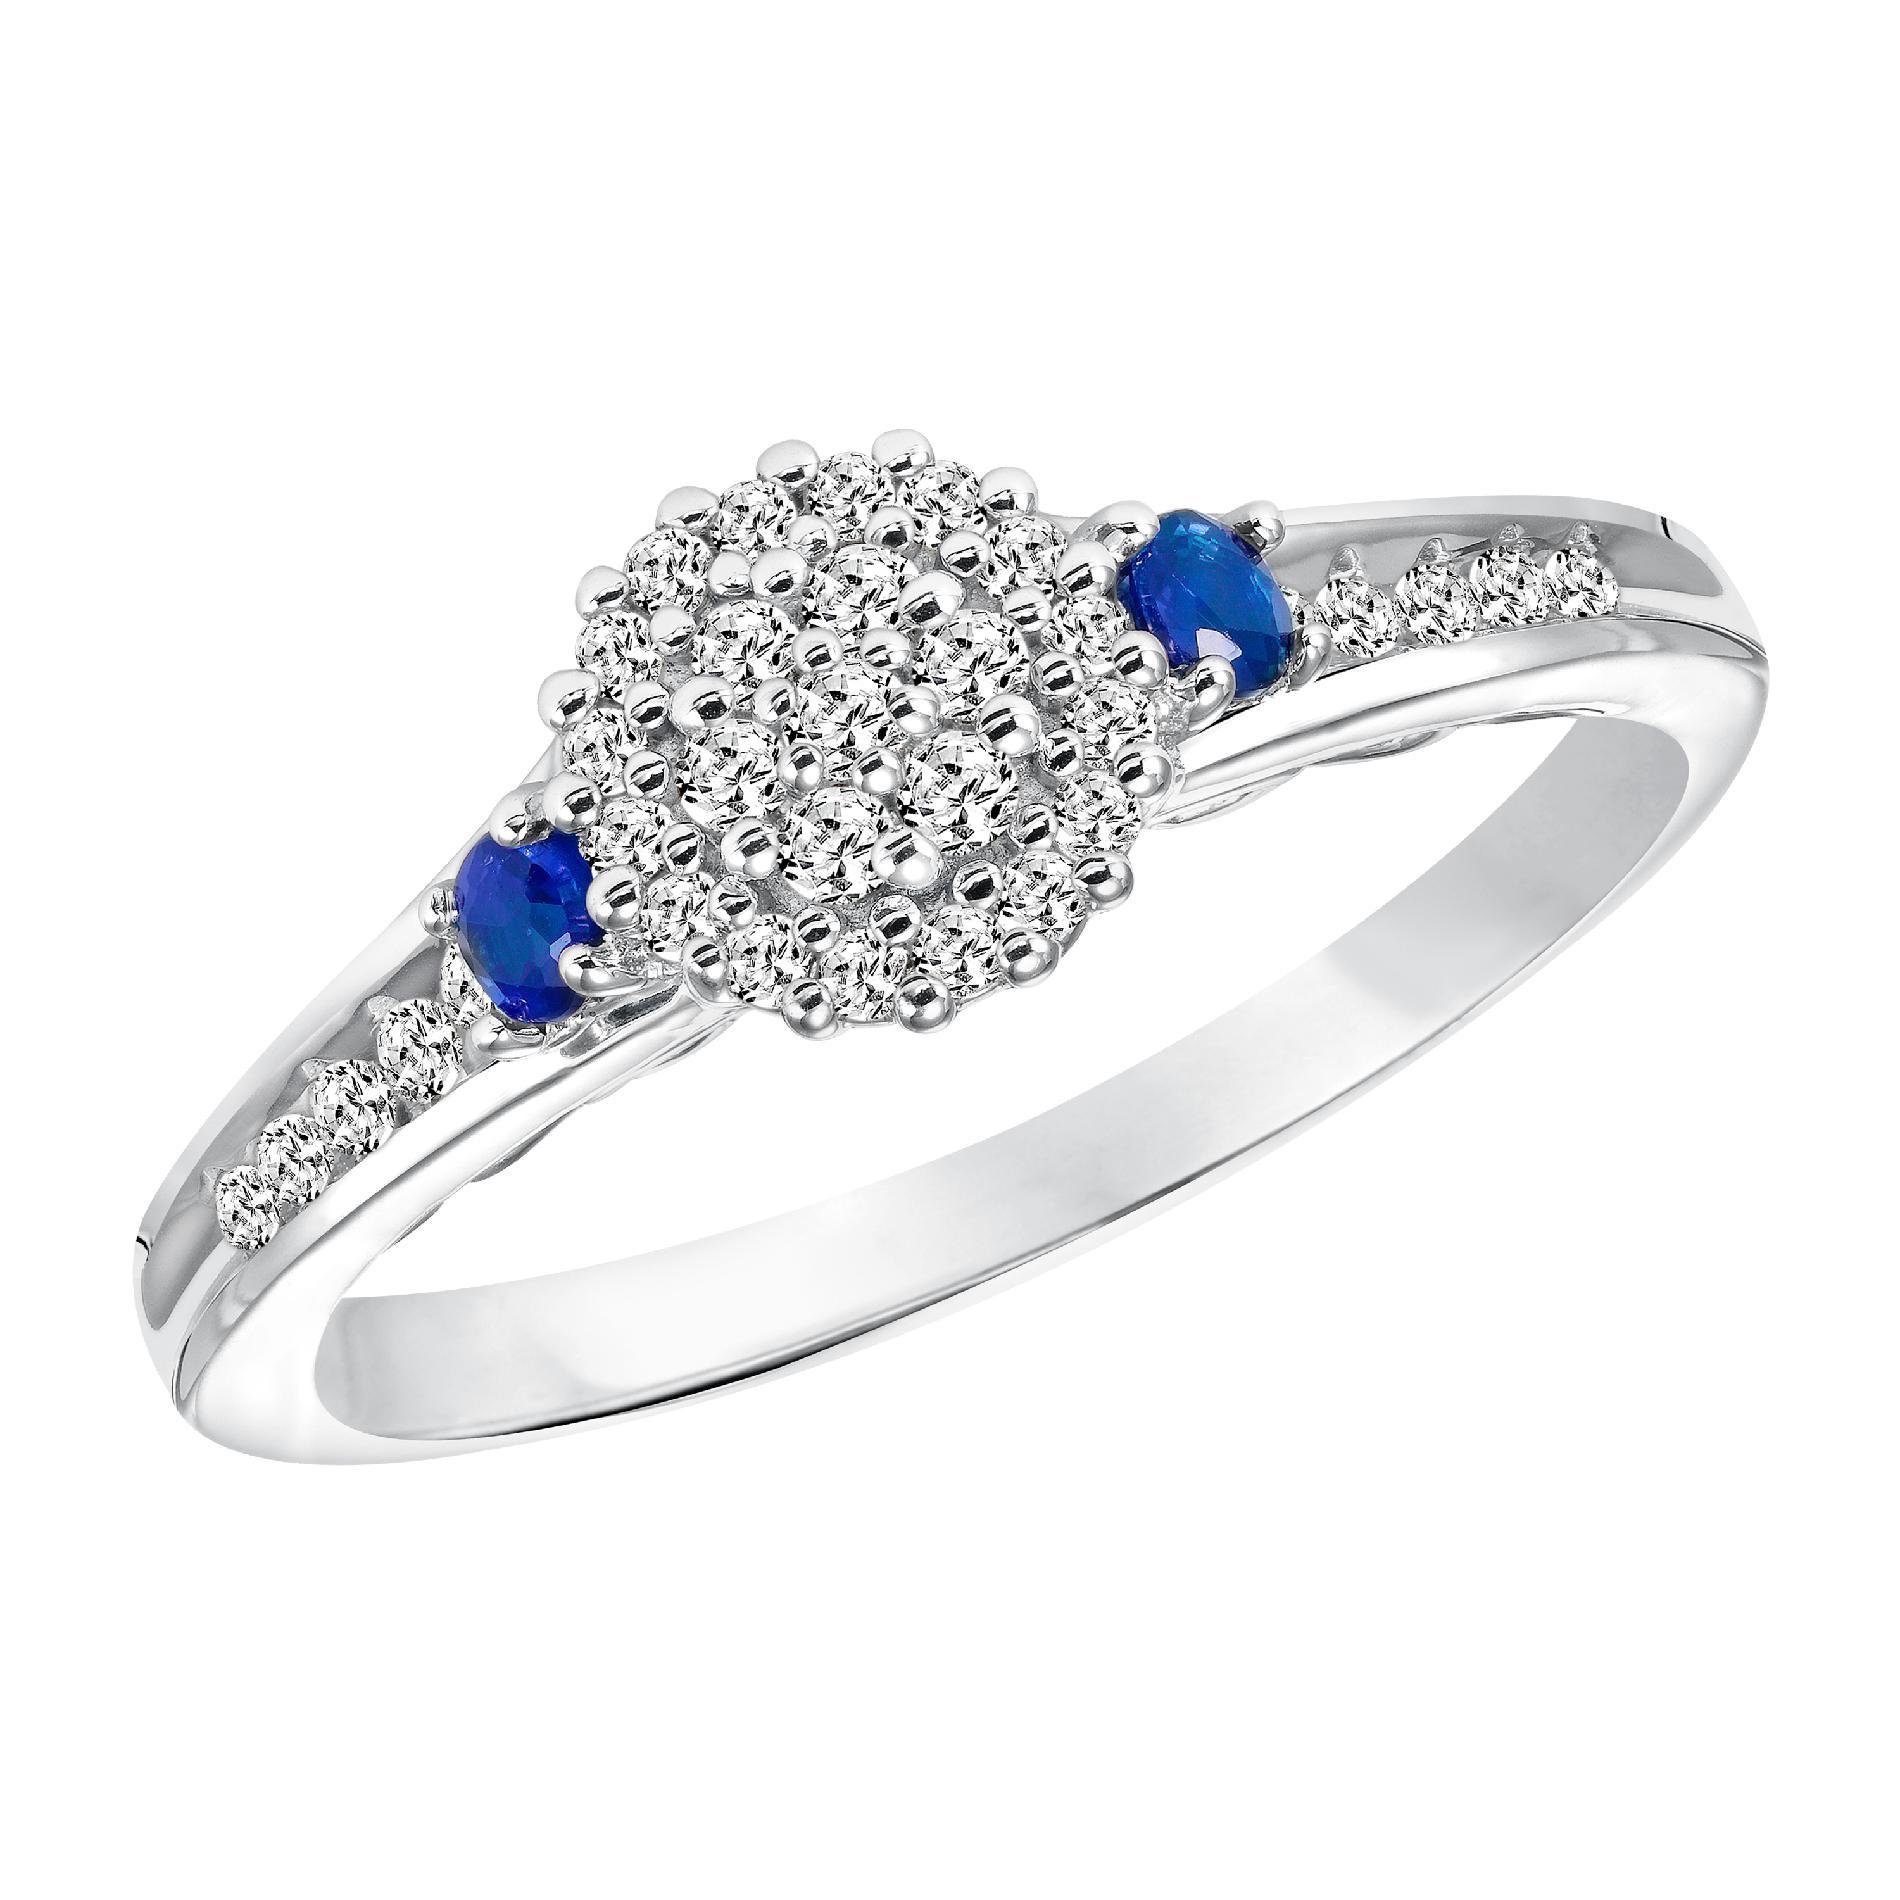 b wedding rings for women Sterling Silver